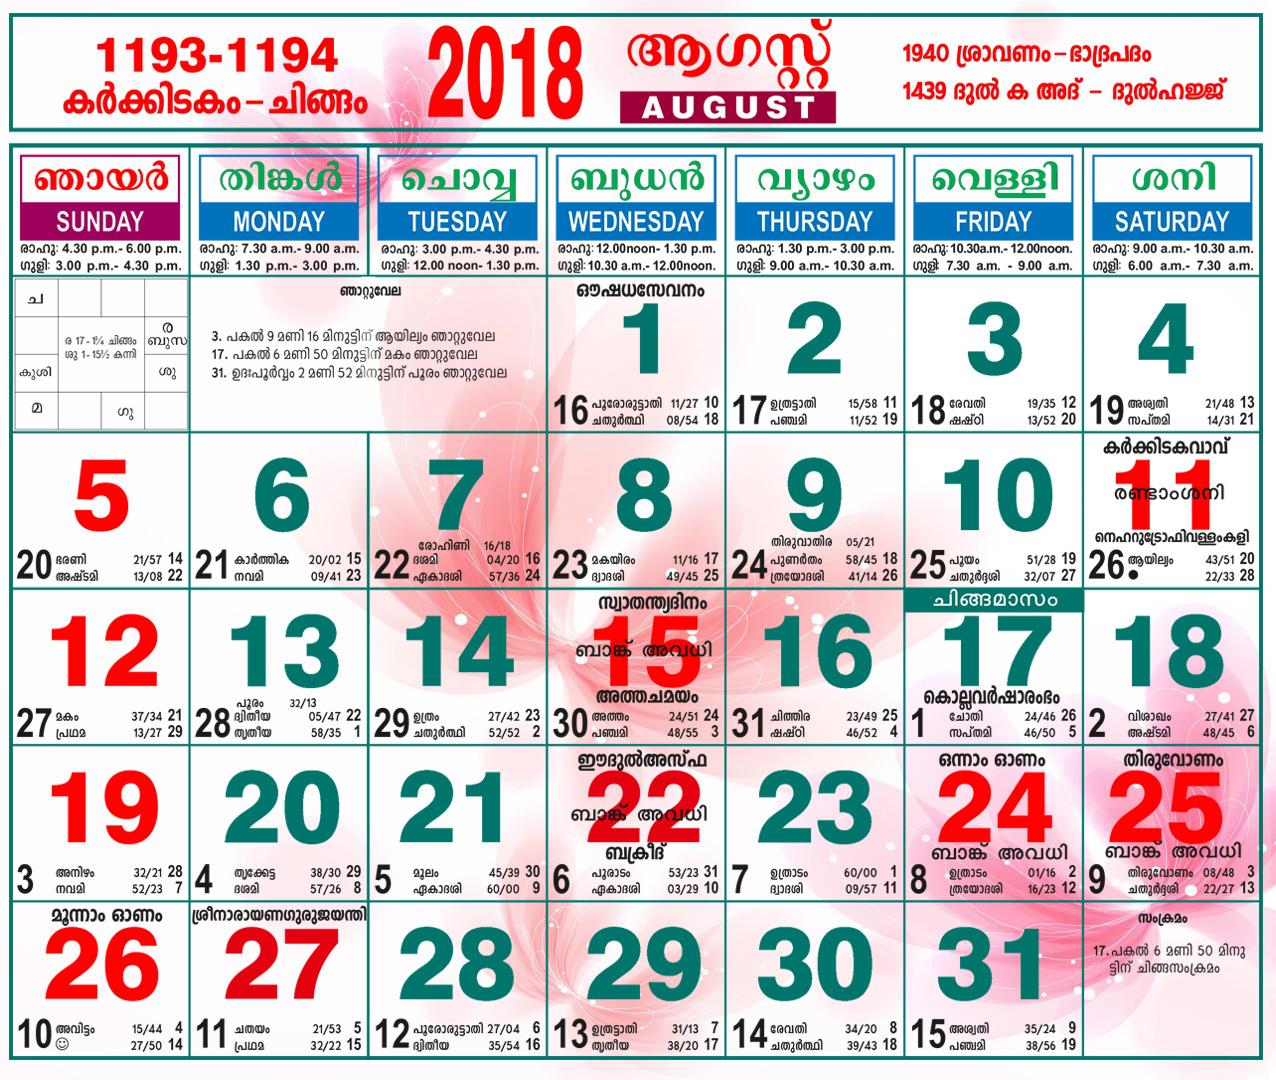 Awesome Deepika Malayalam Calendar 2019 Pdf Free Download inside Malayalam Calendar September 2018